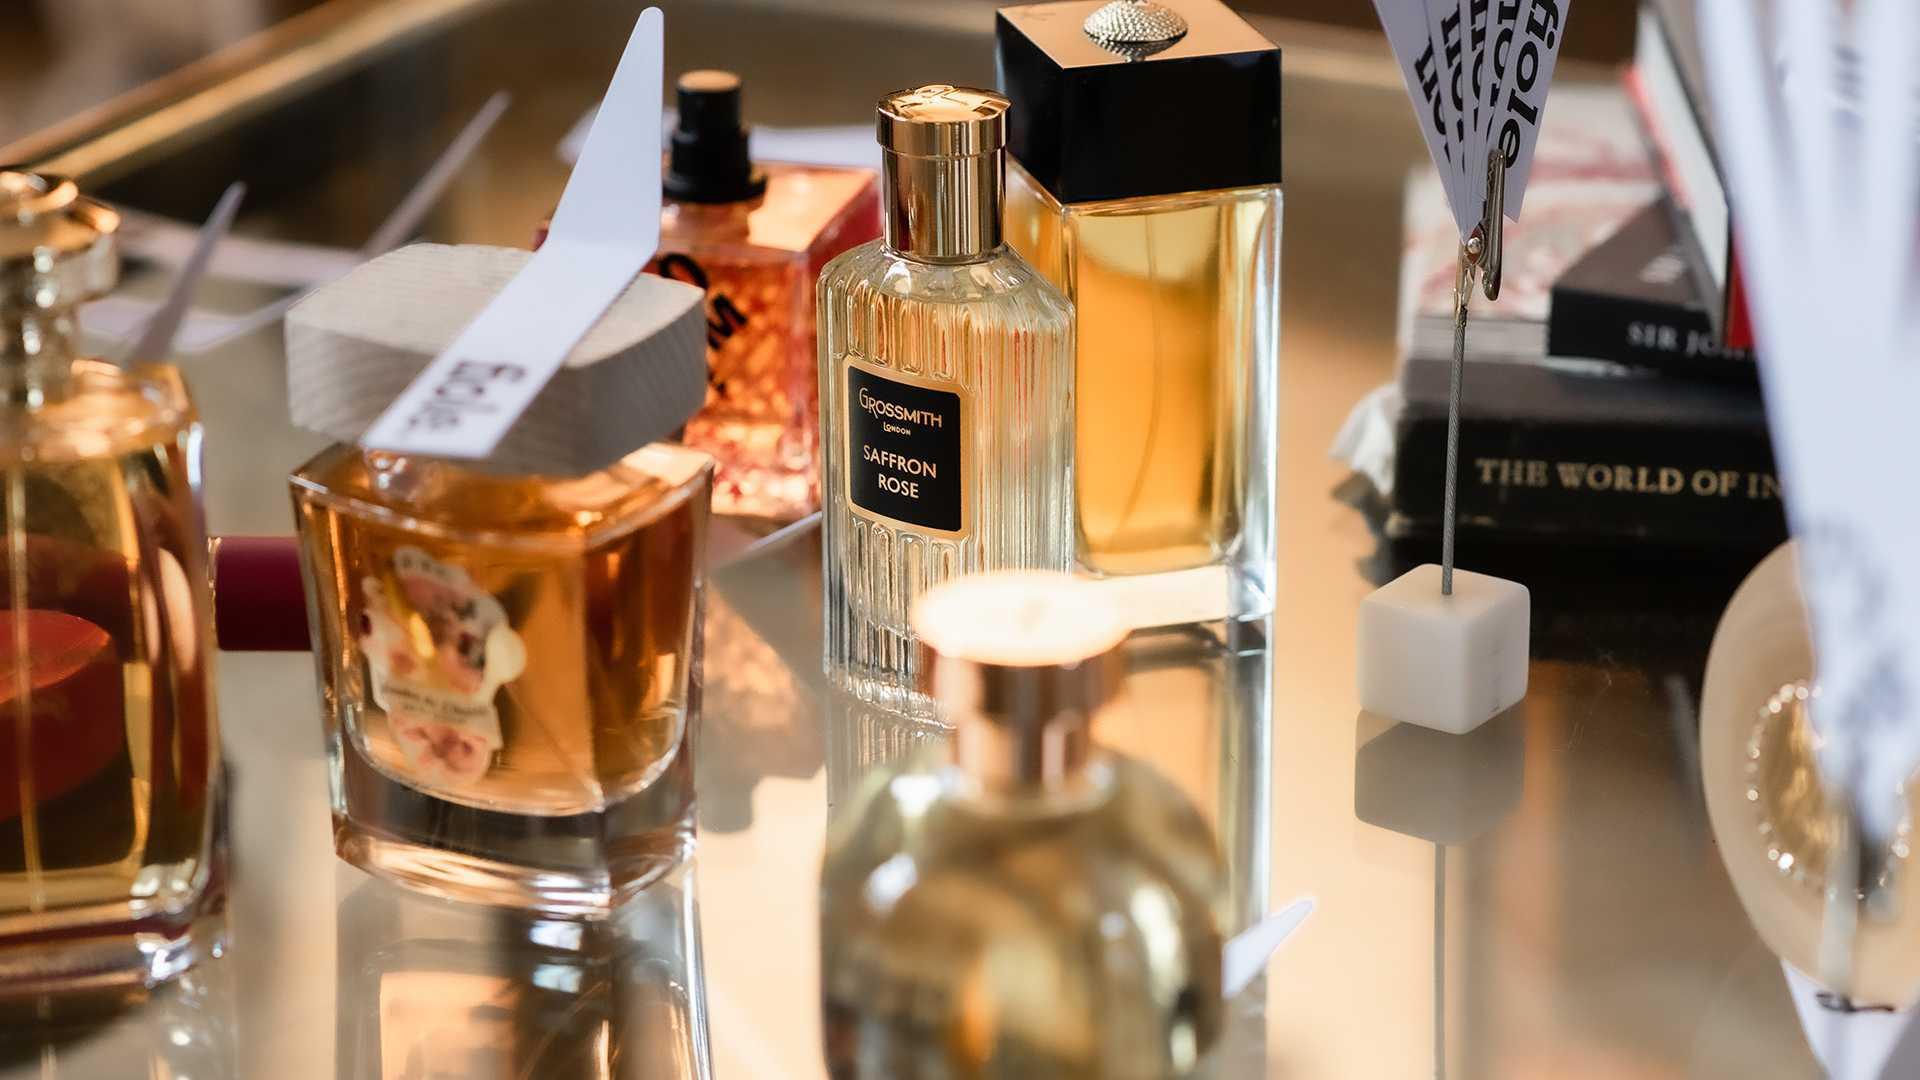 Fiole fragrances